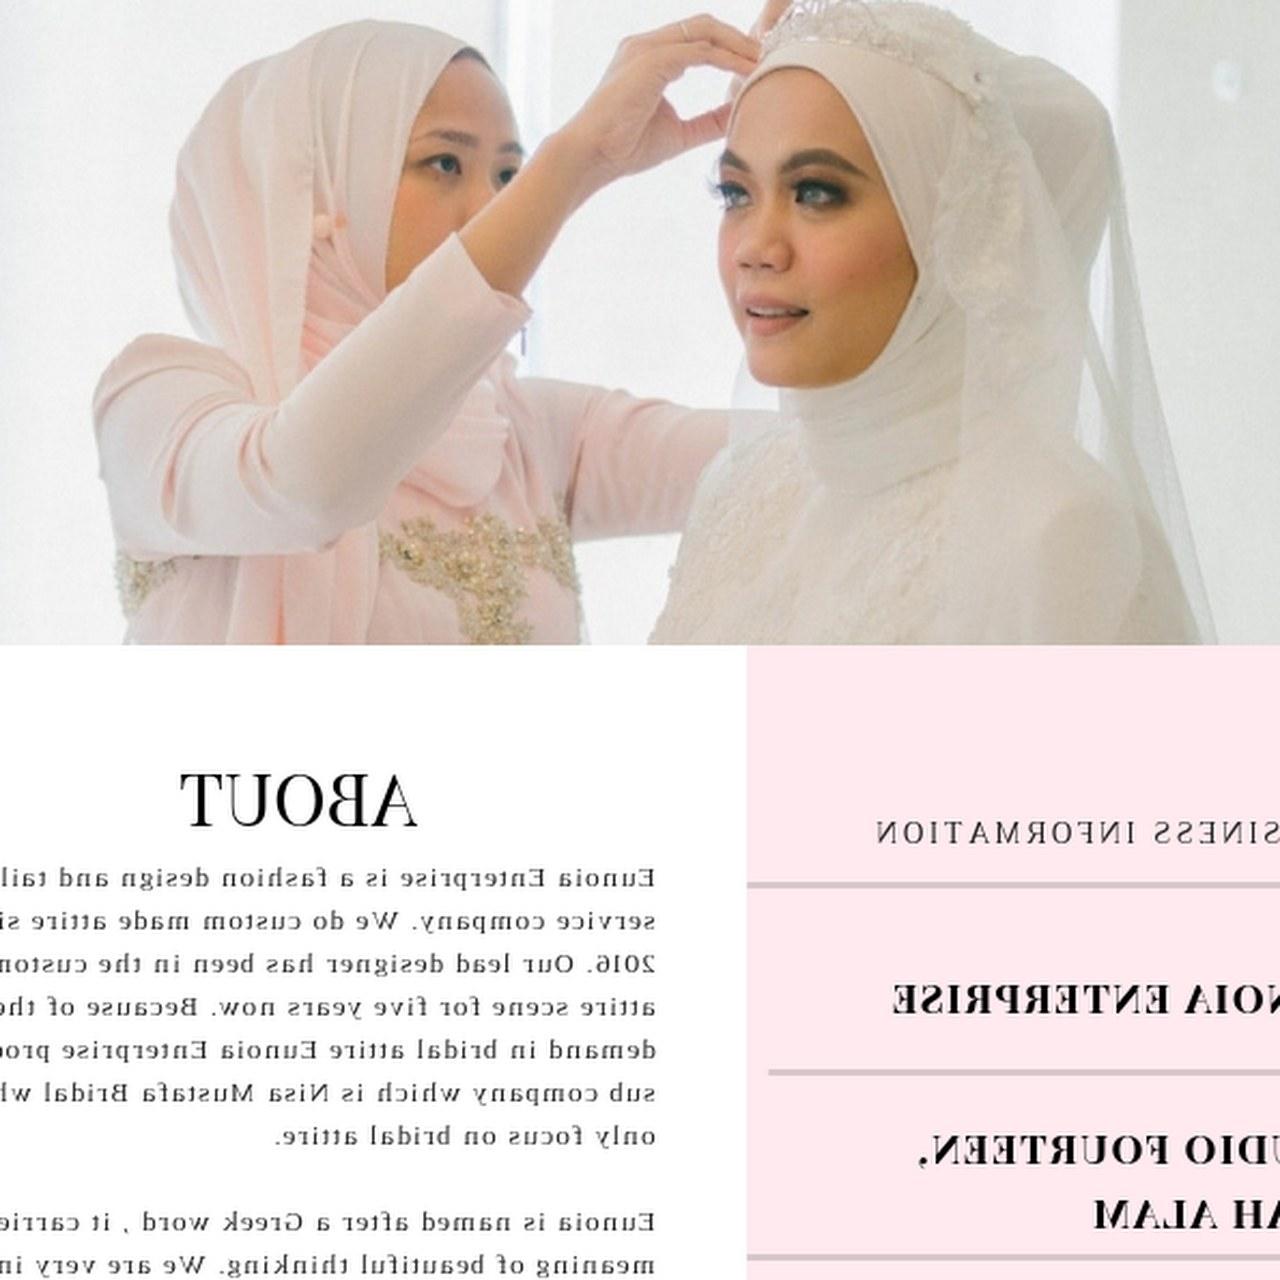 Bentuk Seragam Bridesmaid Hijab Wddj Eunoiabynisa Art Studio In Seksyen 14